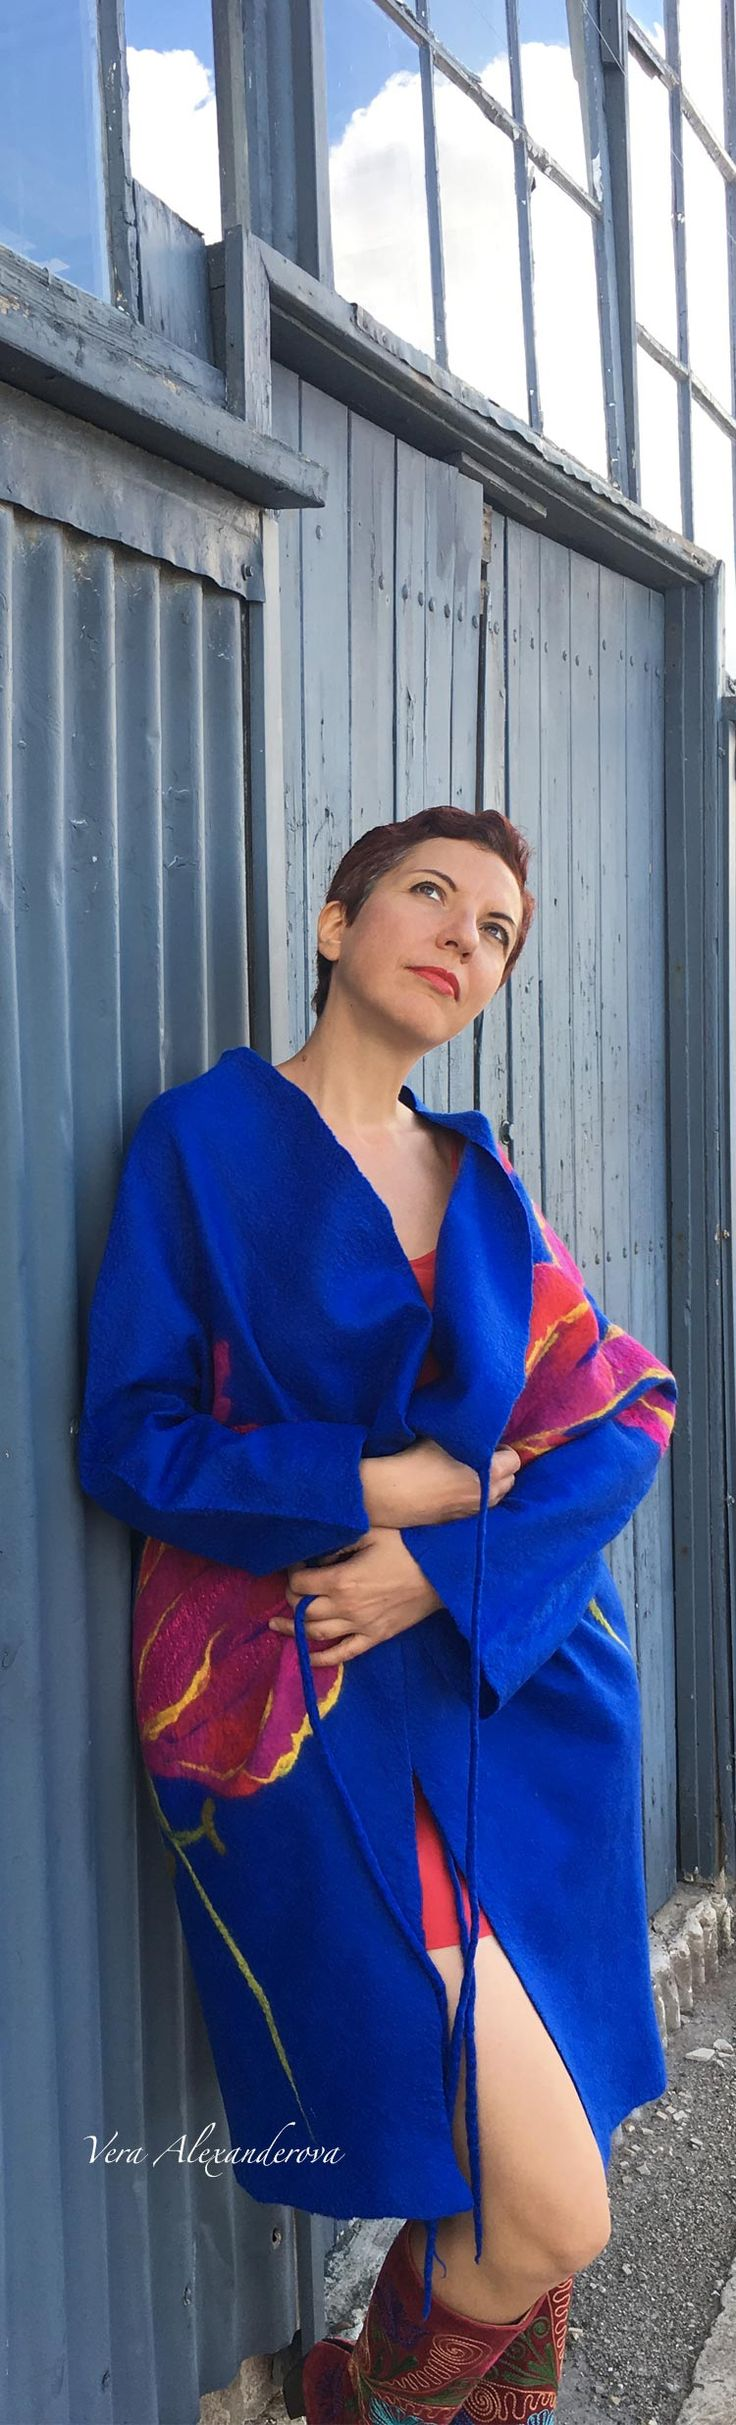 Buy fashion style handmade blue coat by Vera Alexanderova #fashion #style #handmade #unique #womensfashion #coat #blue #wool #felt